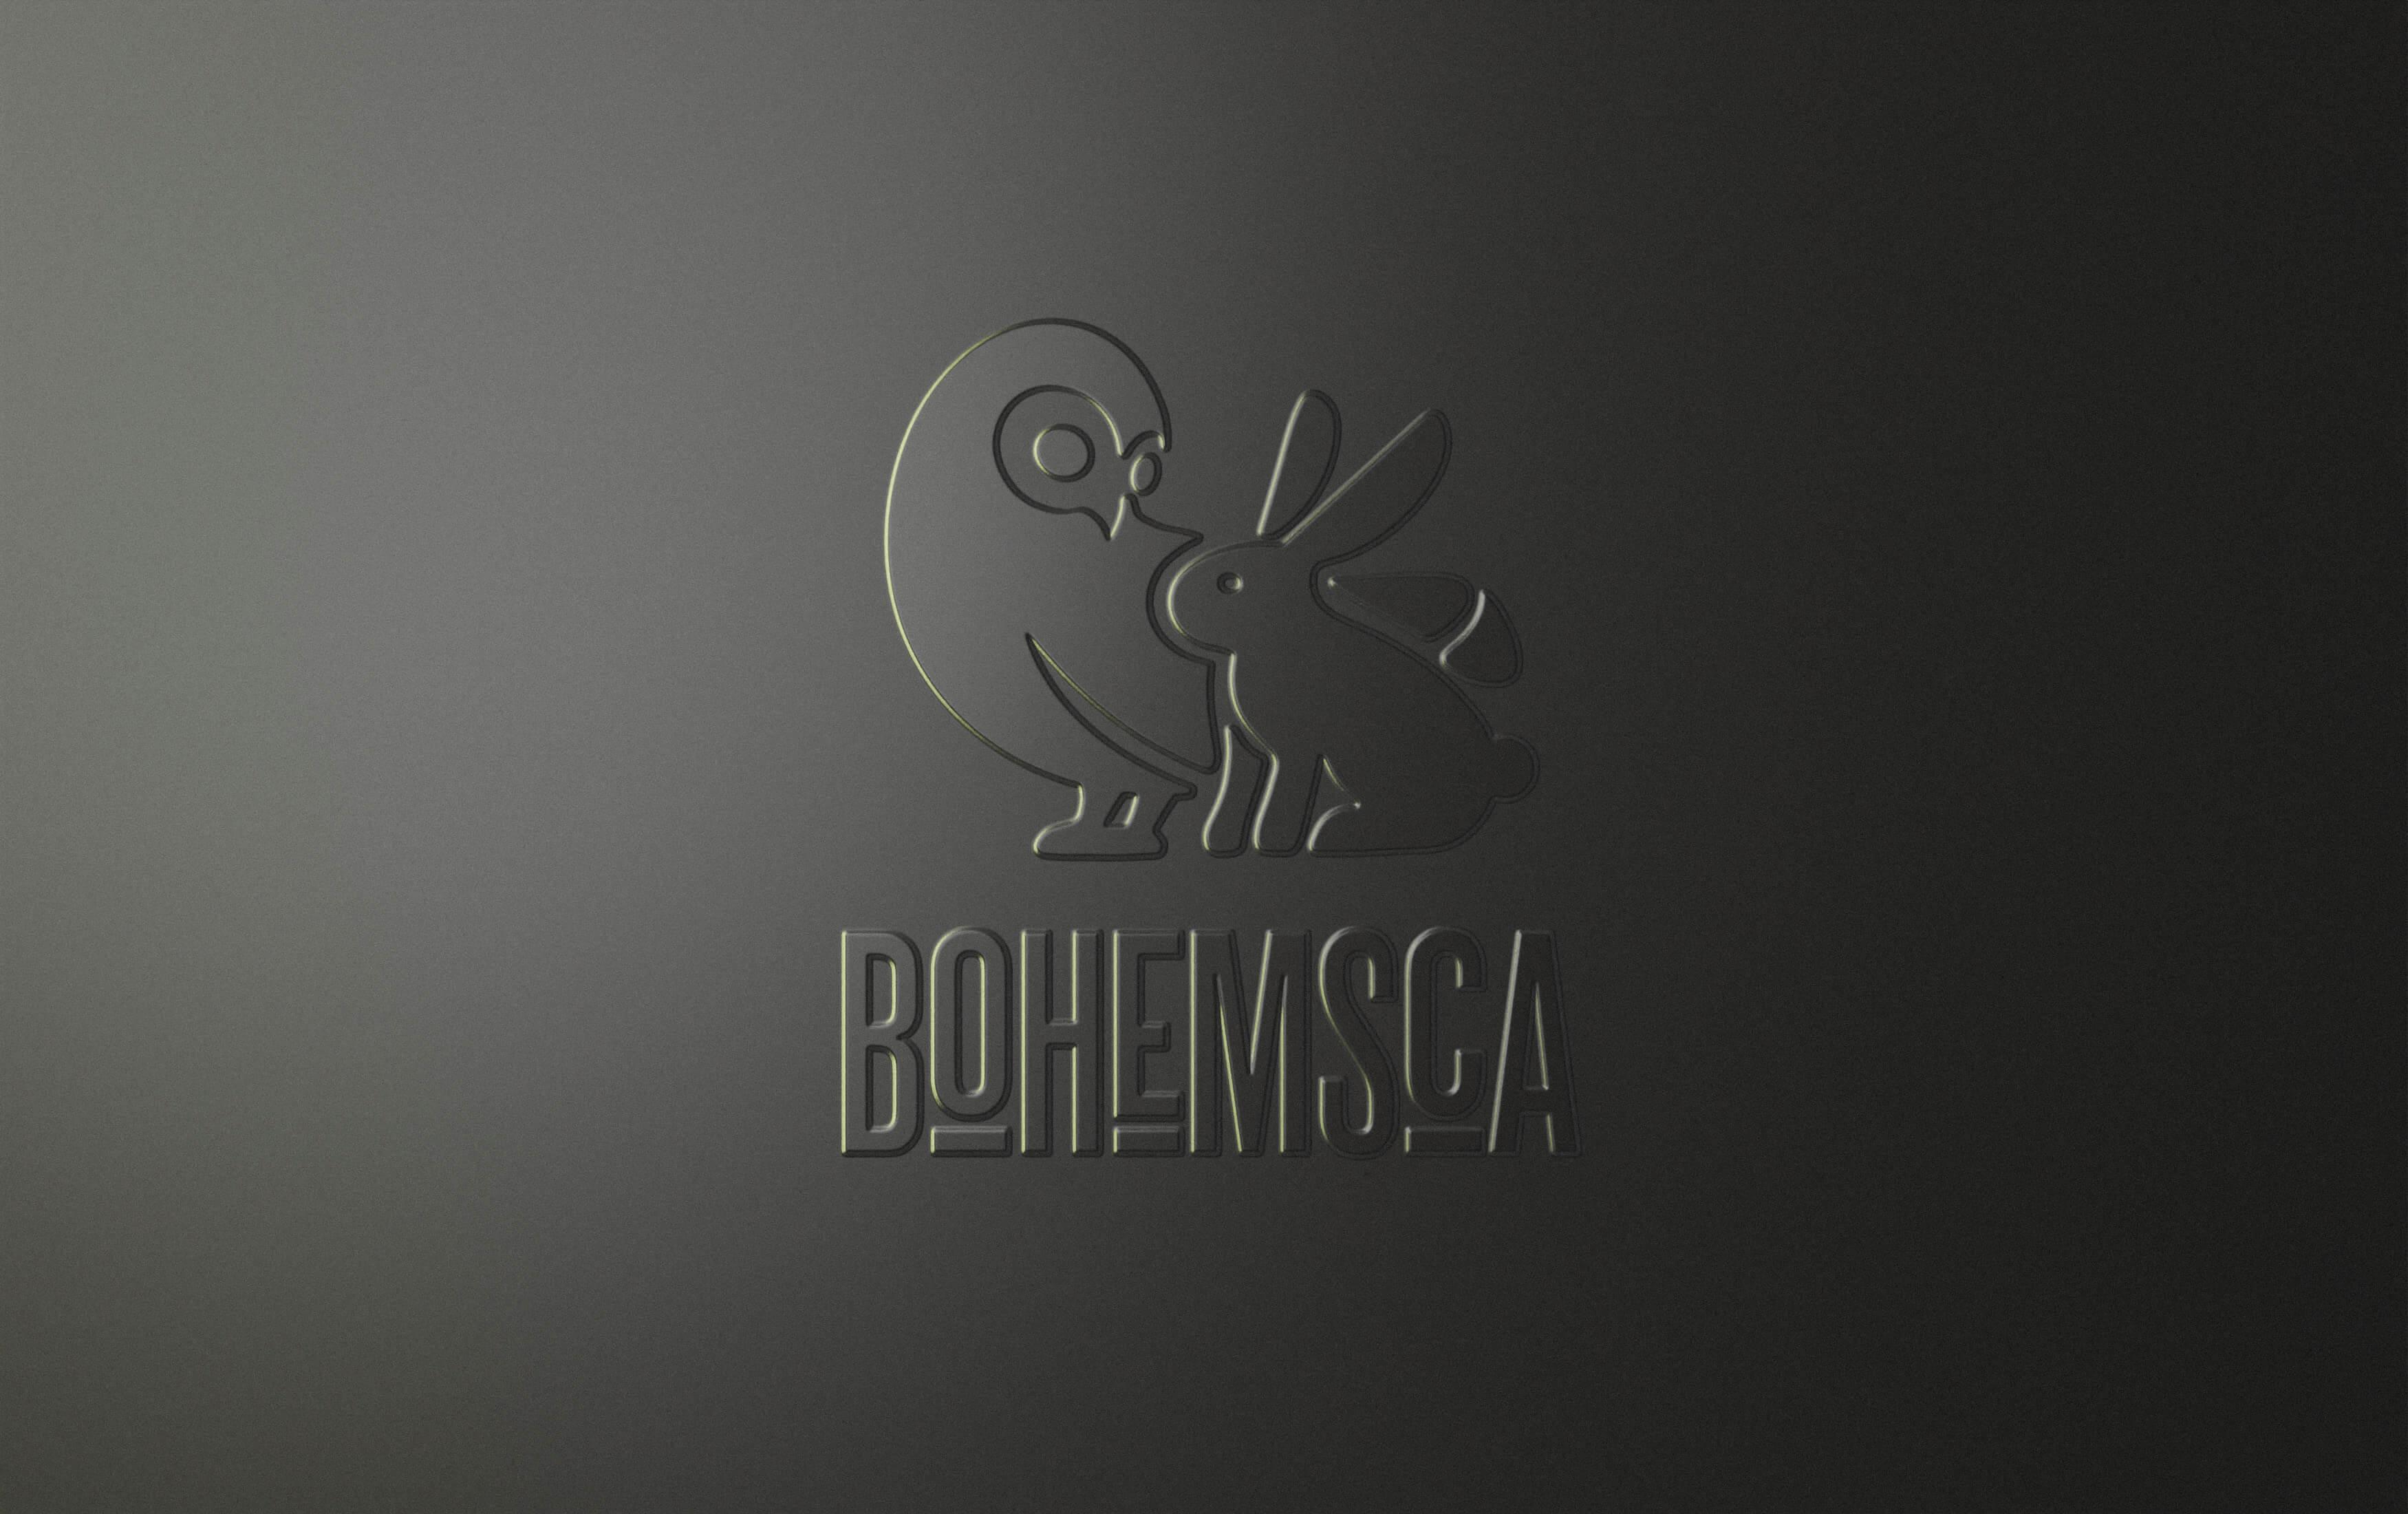 Bohemsca logo design